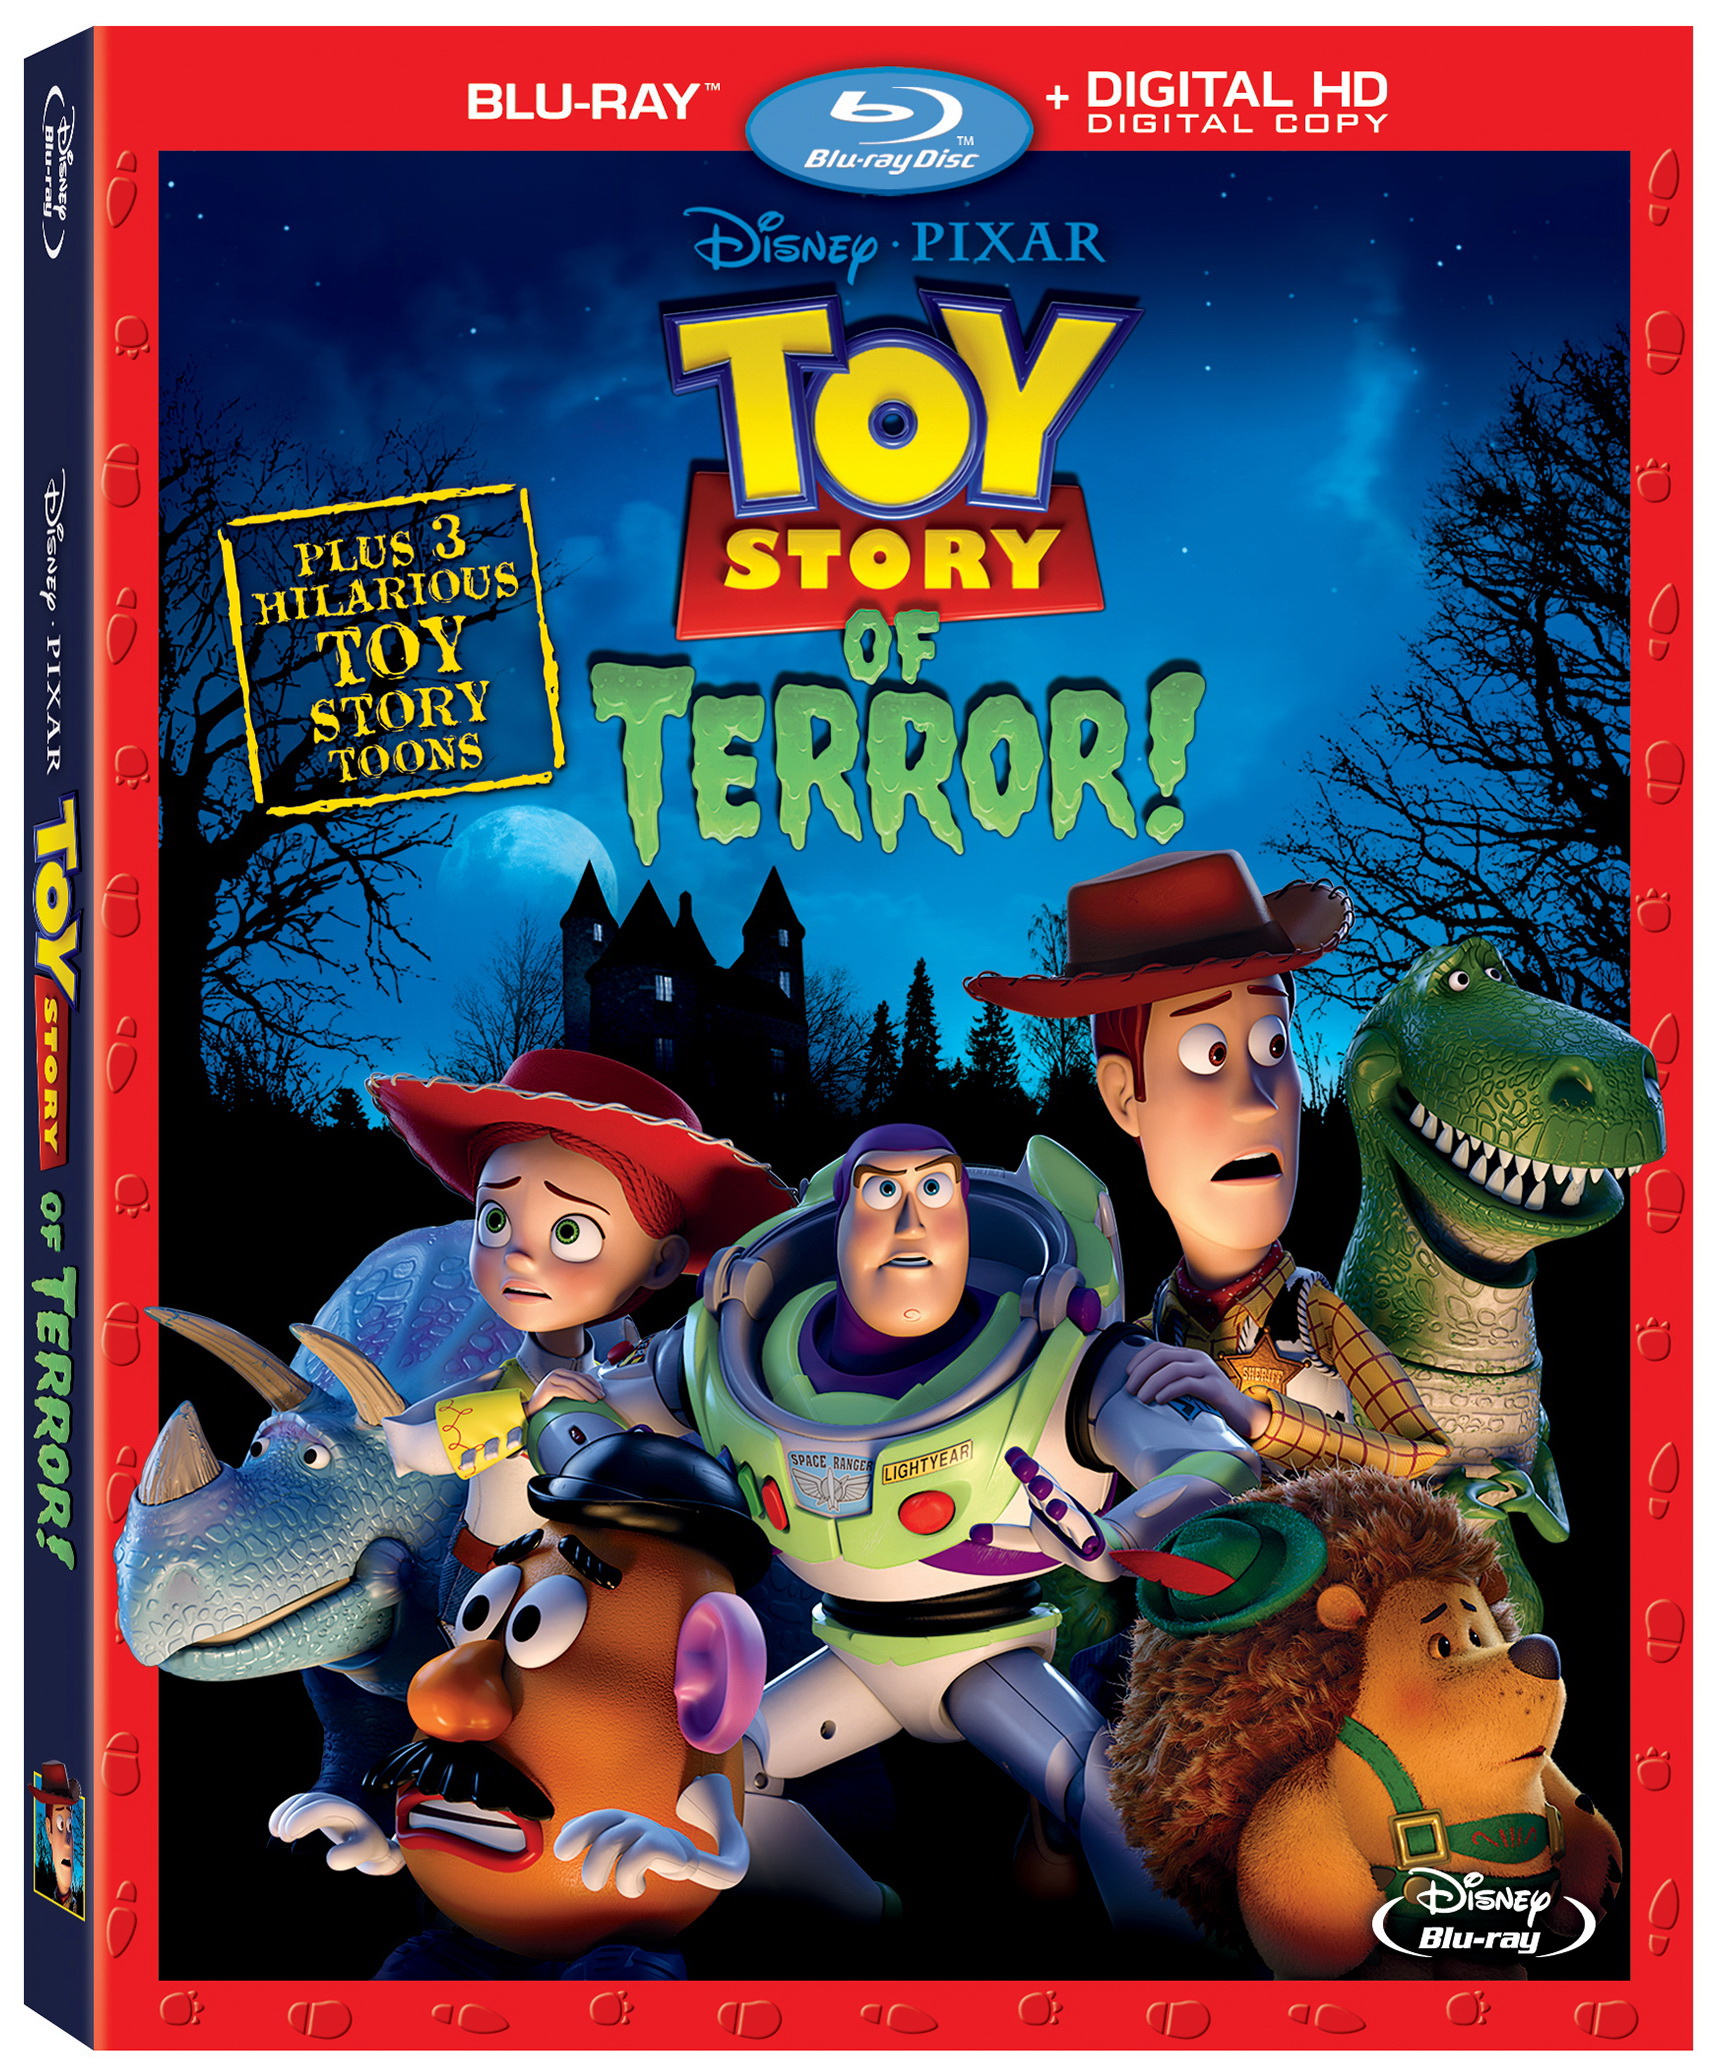 Pixar Disney Toy Story angoisse au motel blu-ray